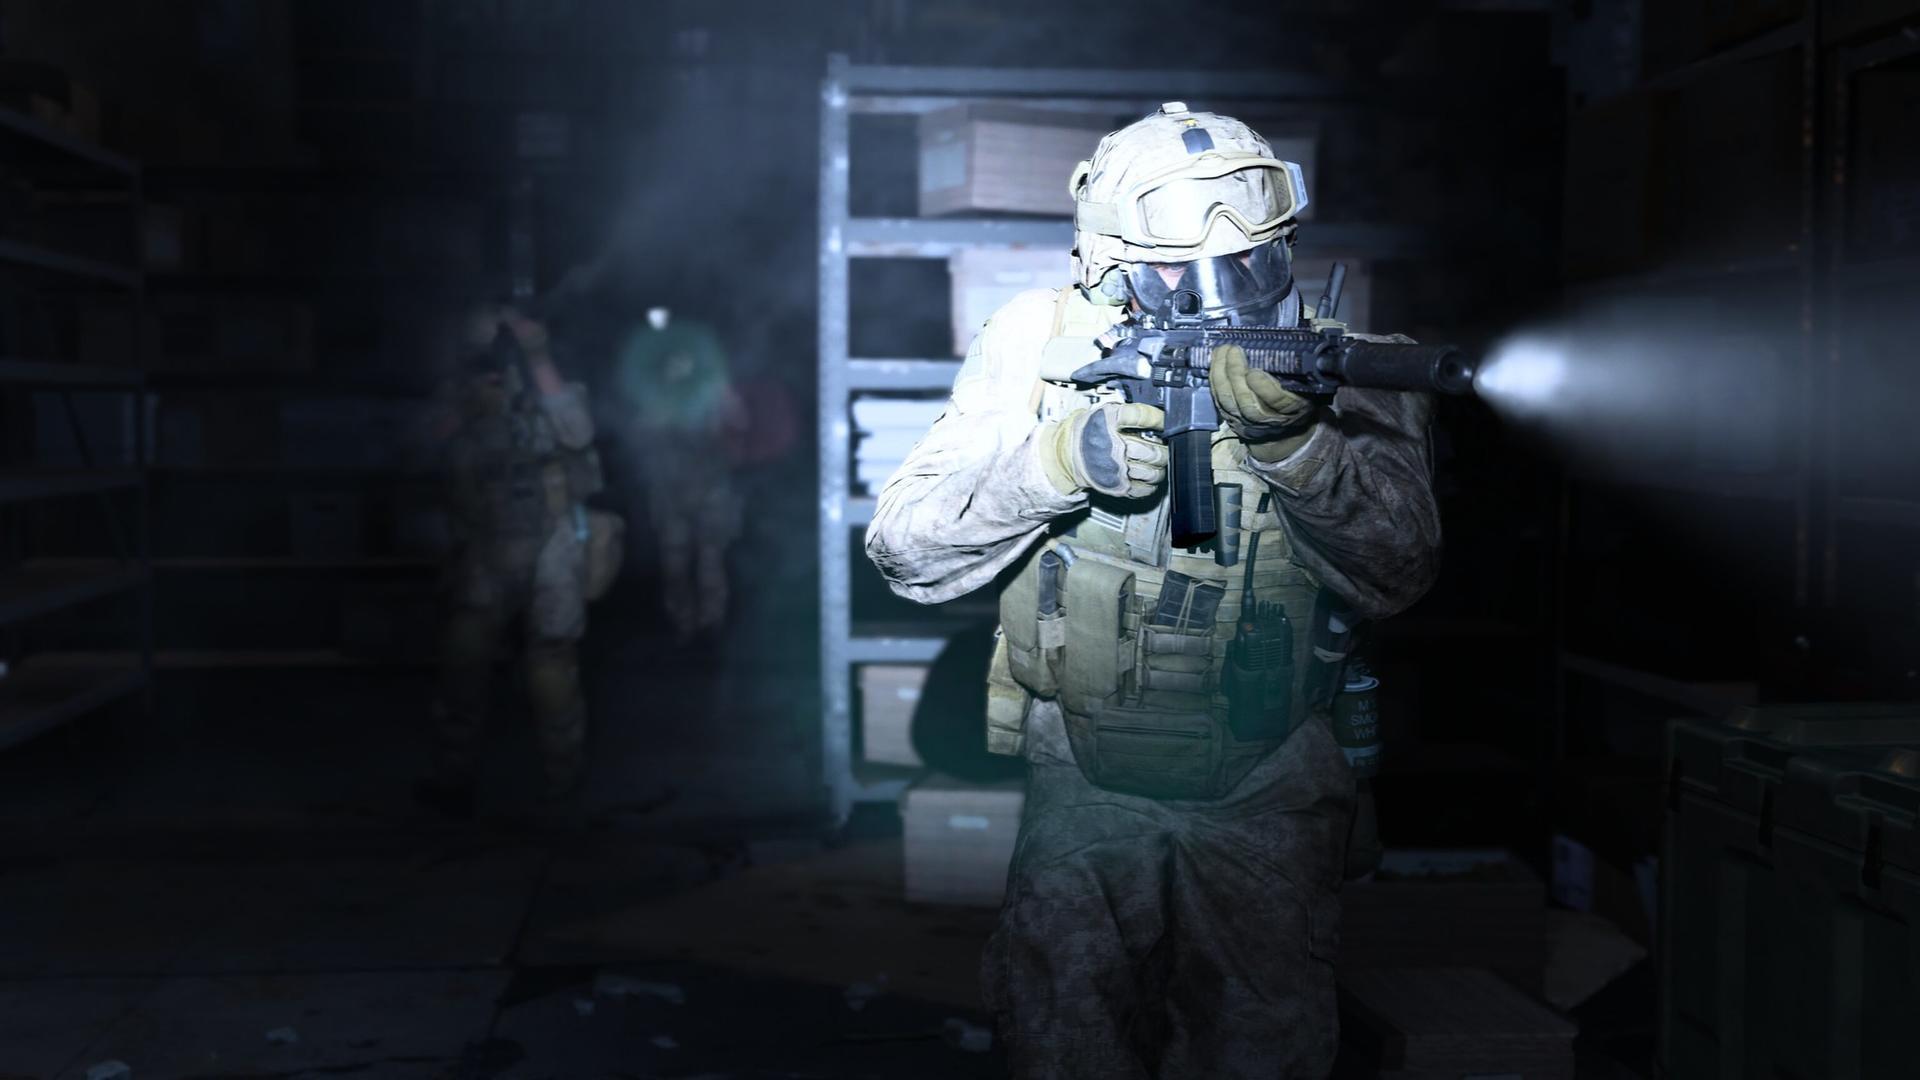 Call of Duty Advanced Warfare verwijderen skill based matchmaking